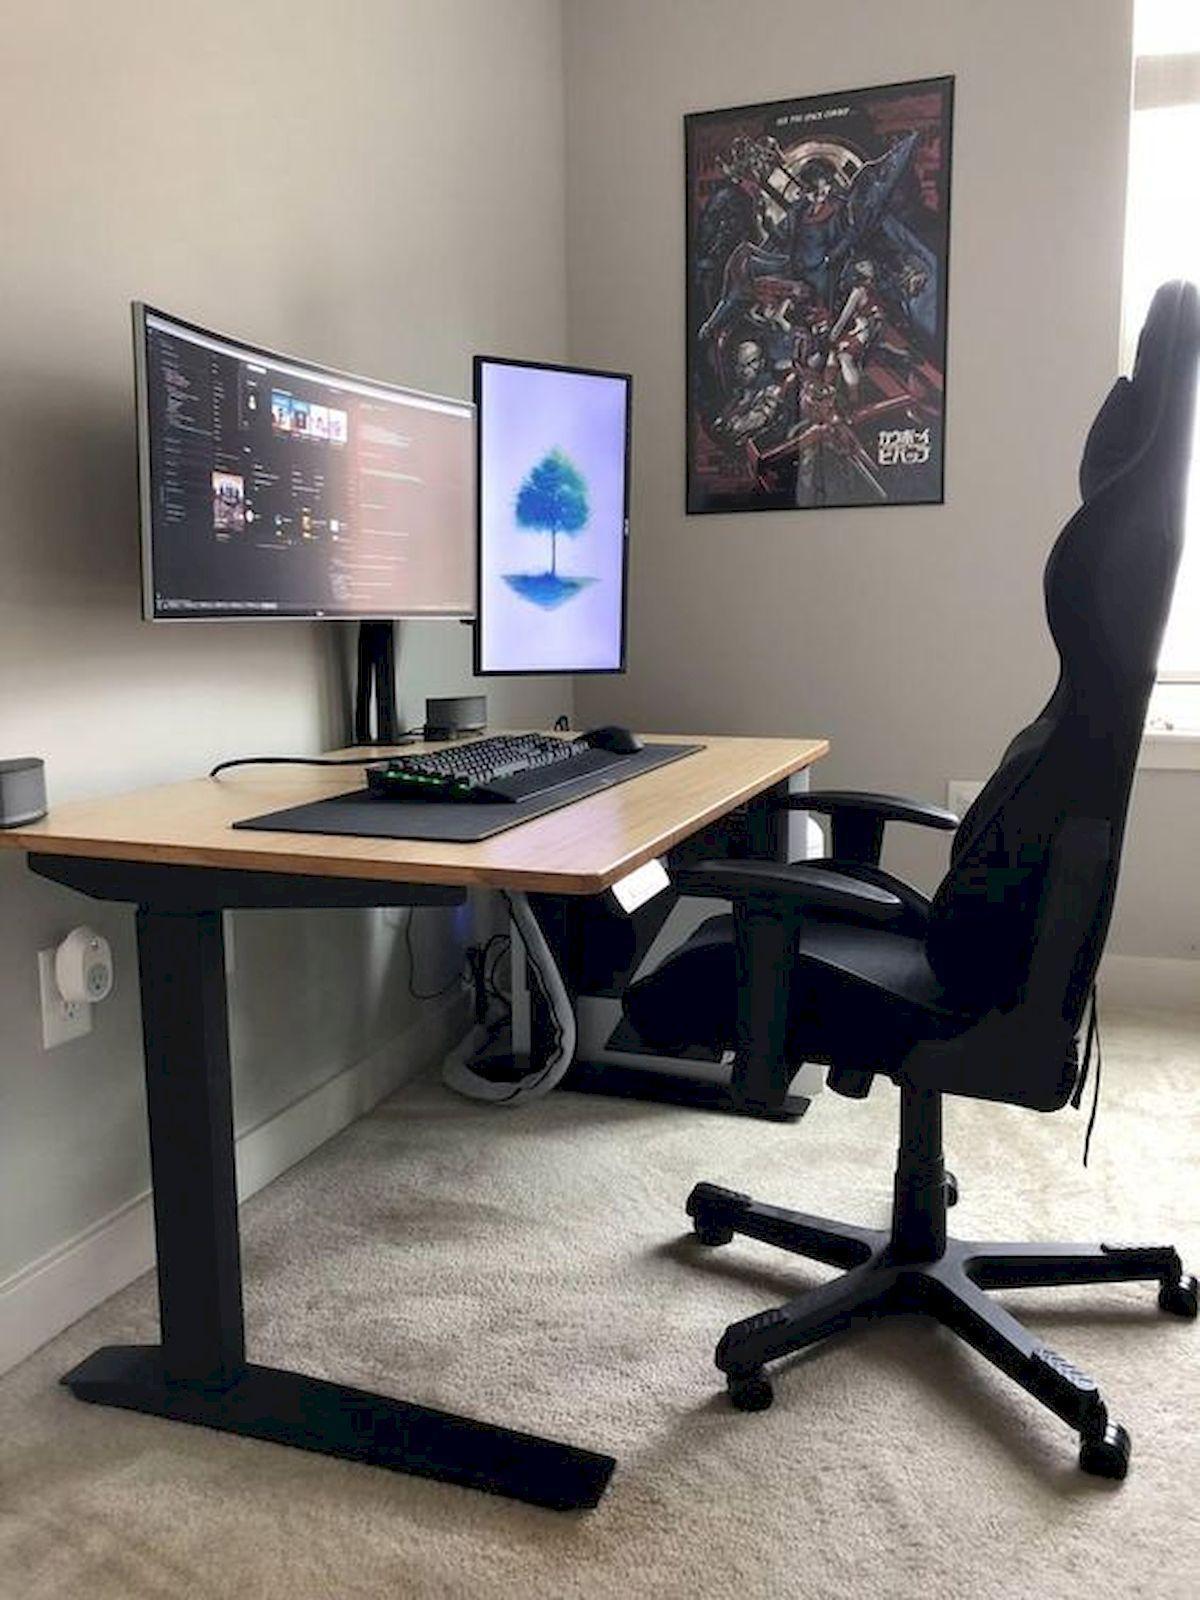 22 Diy Computer Desk Ideas That Make More Spirit Work Enthusiasthome Home Office Setup Home Office Design Diy Computer Desk